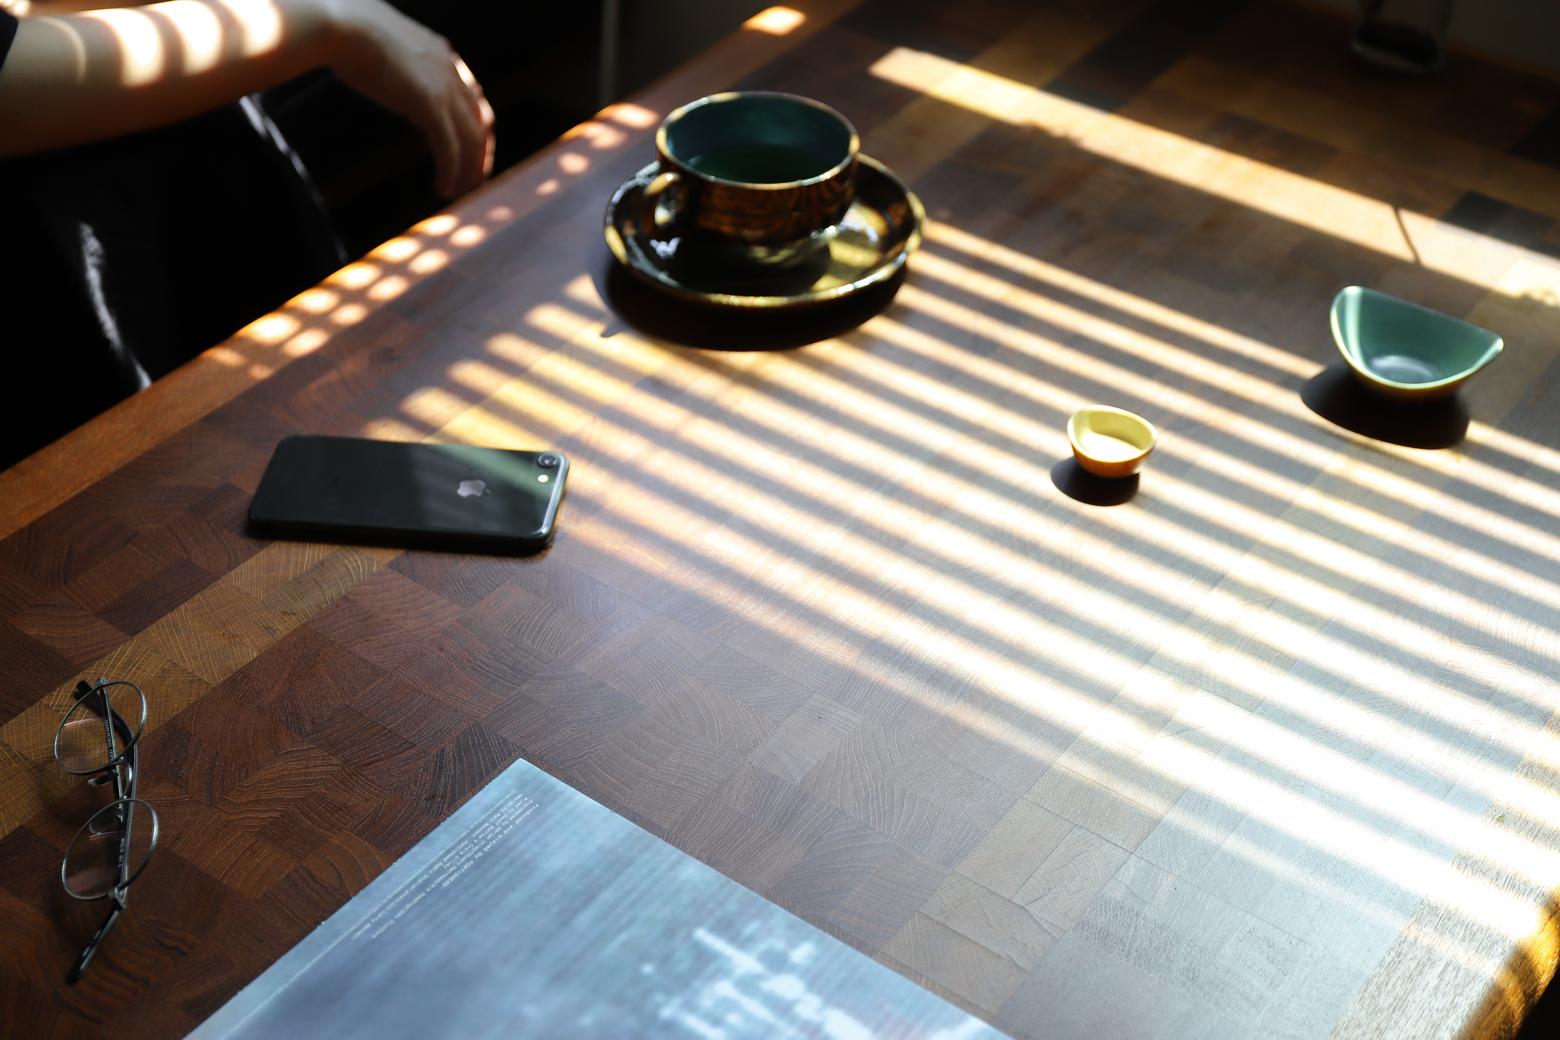 Tranekær Furniture Center Table/トラネケア センターテーブル ロルフ・ミドルボー ゴーム・リンドム デンマーク 北欧家具 ヴィンテージ